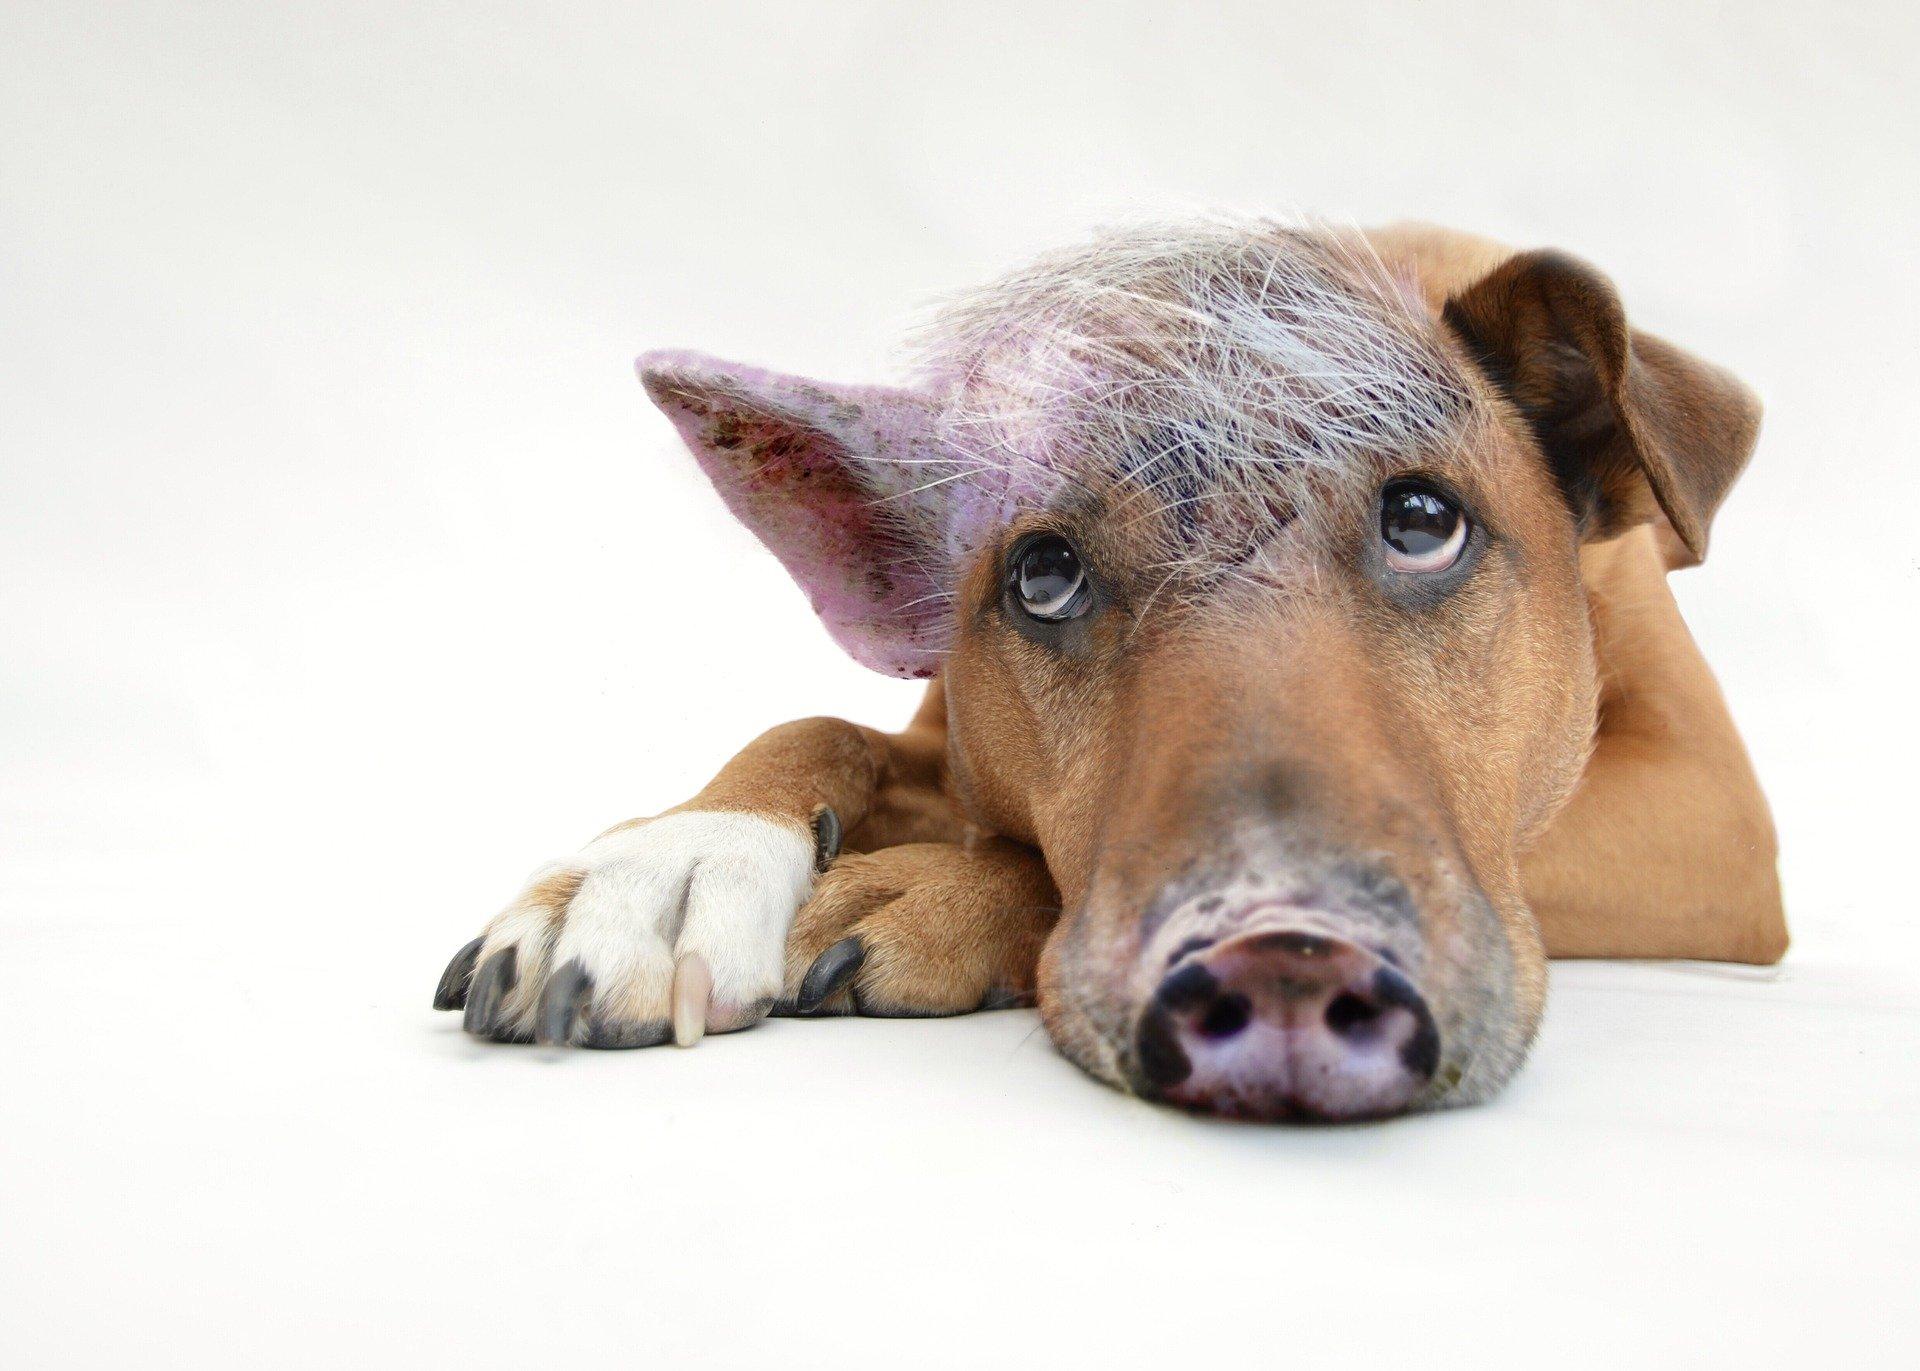 2021-04-06-Pixabay Schweinehund 2613125_1920